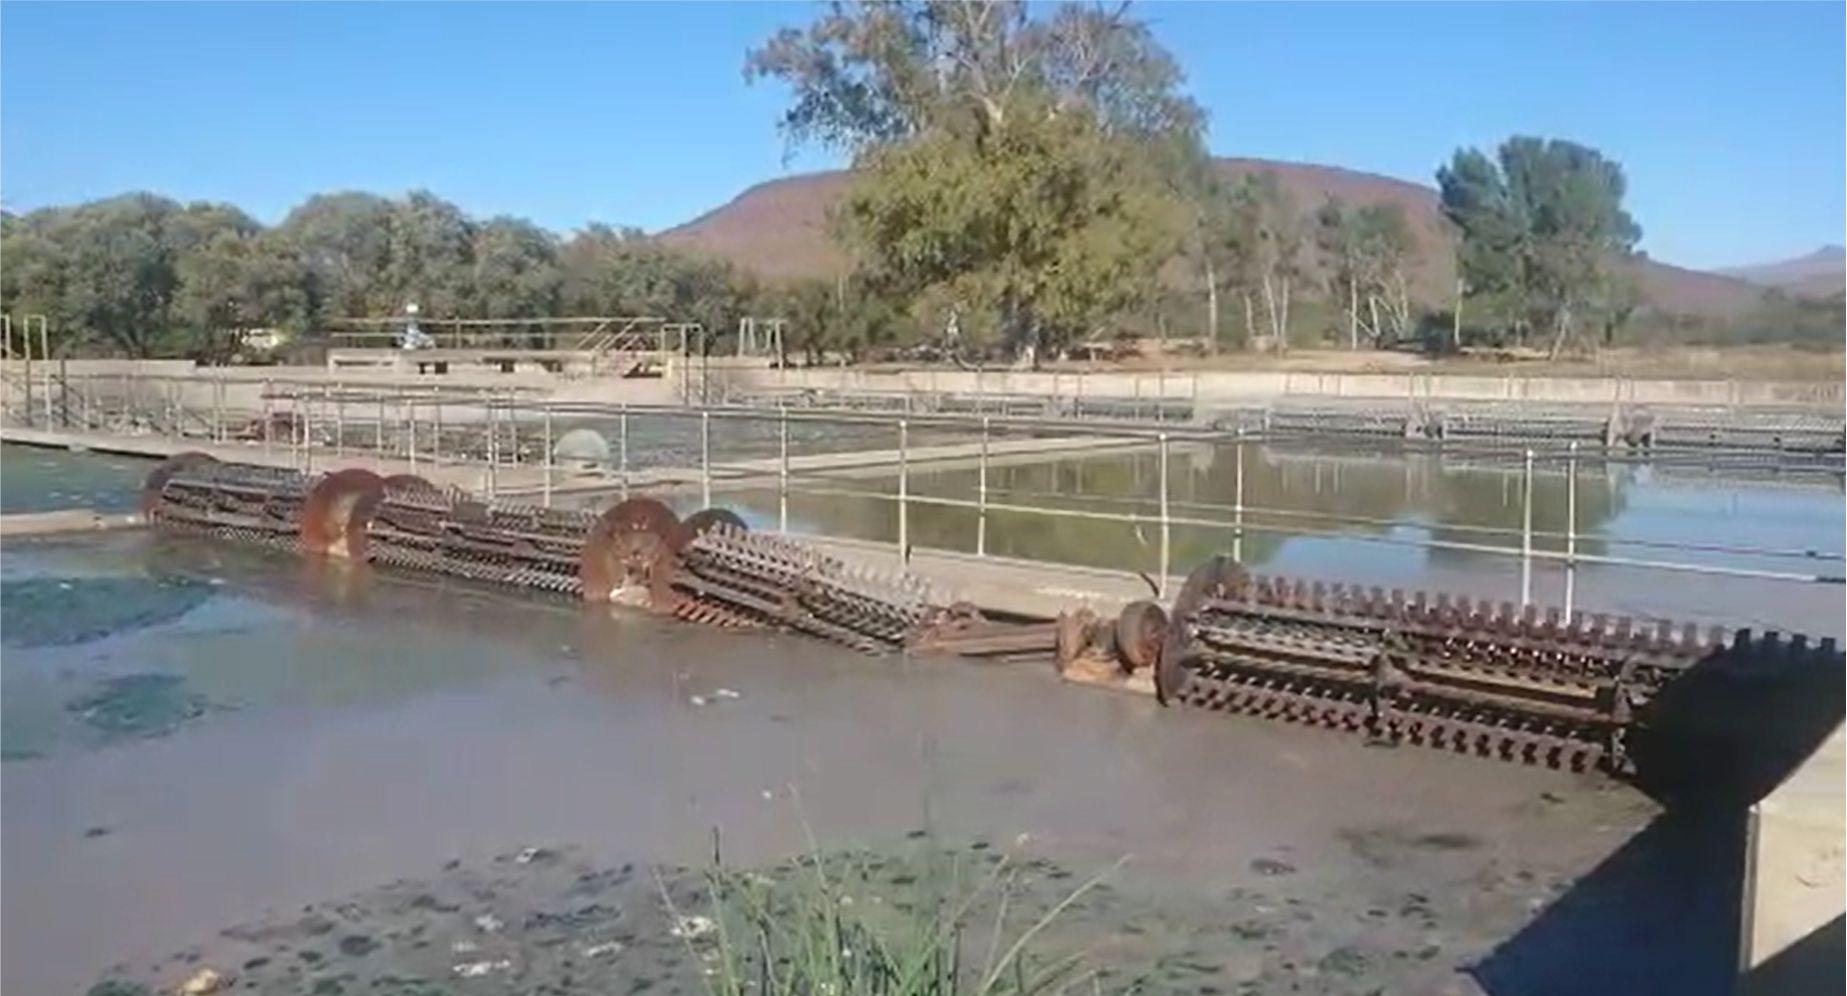 SAHRC to investigate Fish River sewage crisis